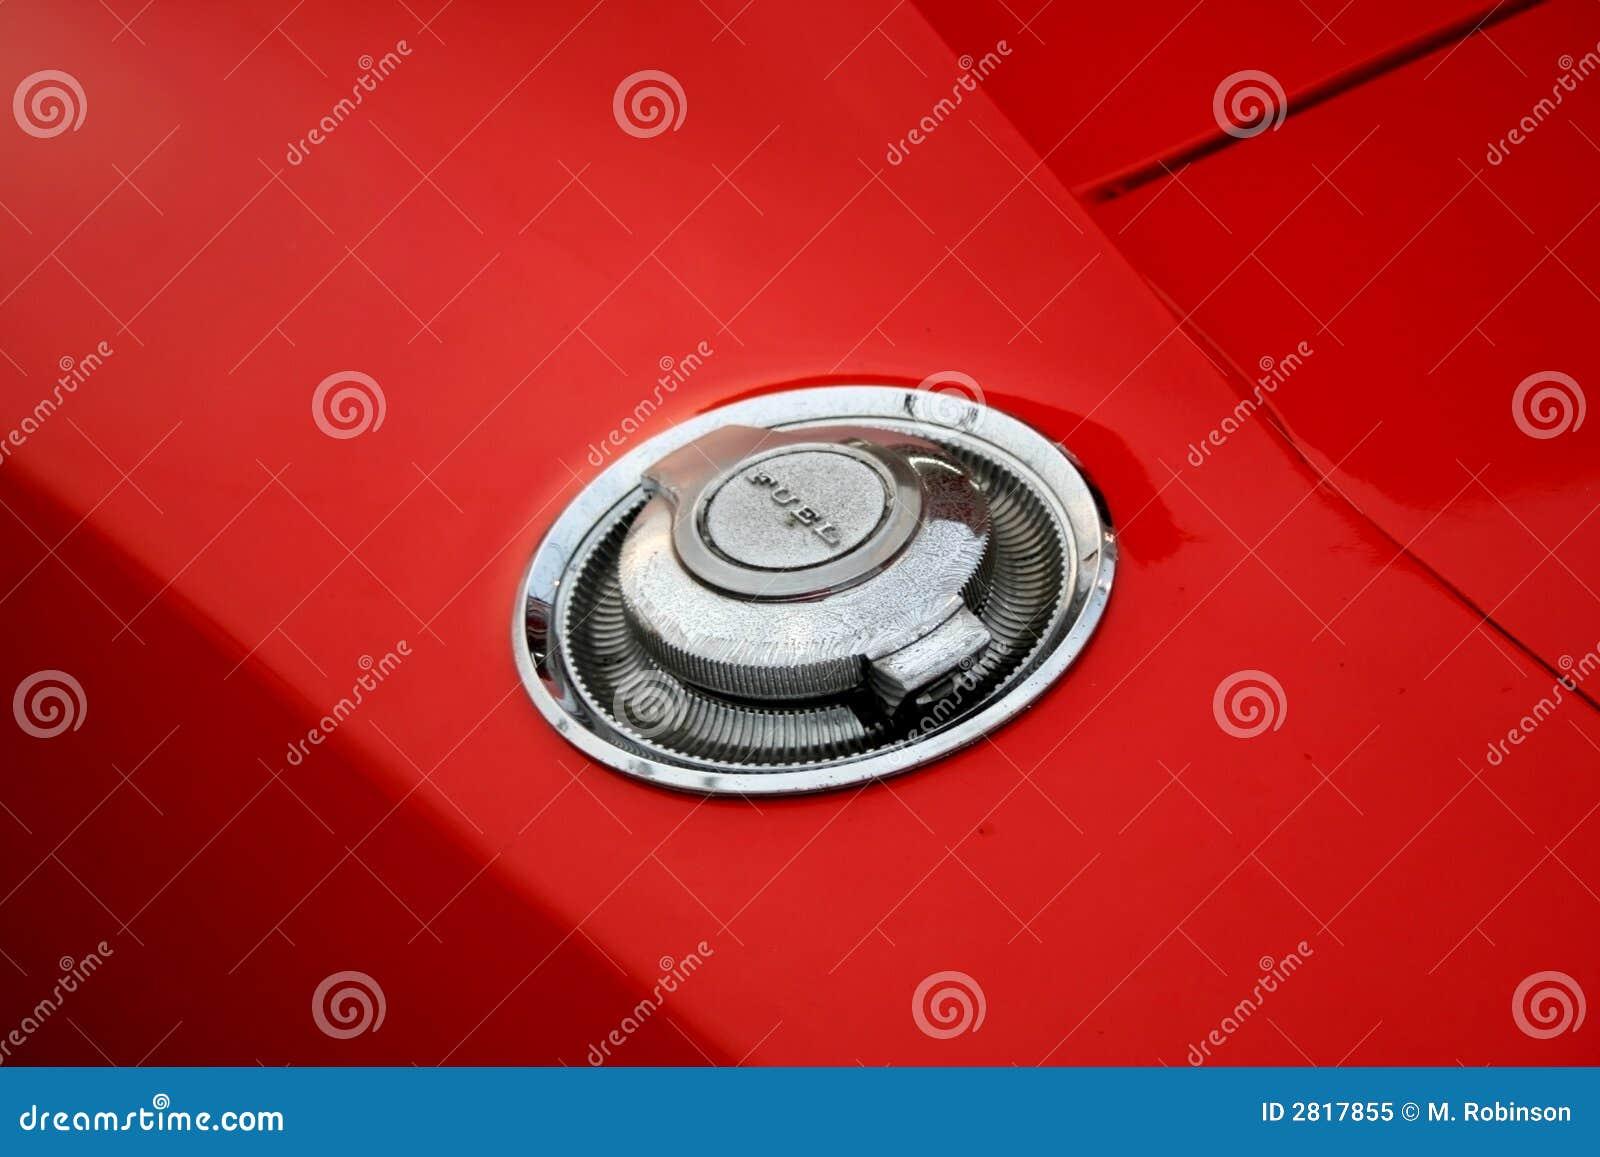 Automotive Gas Cap : Muscle car gas cap stock image of transportation